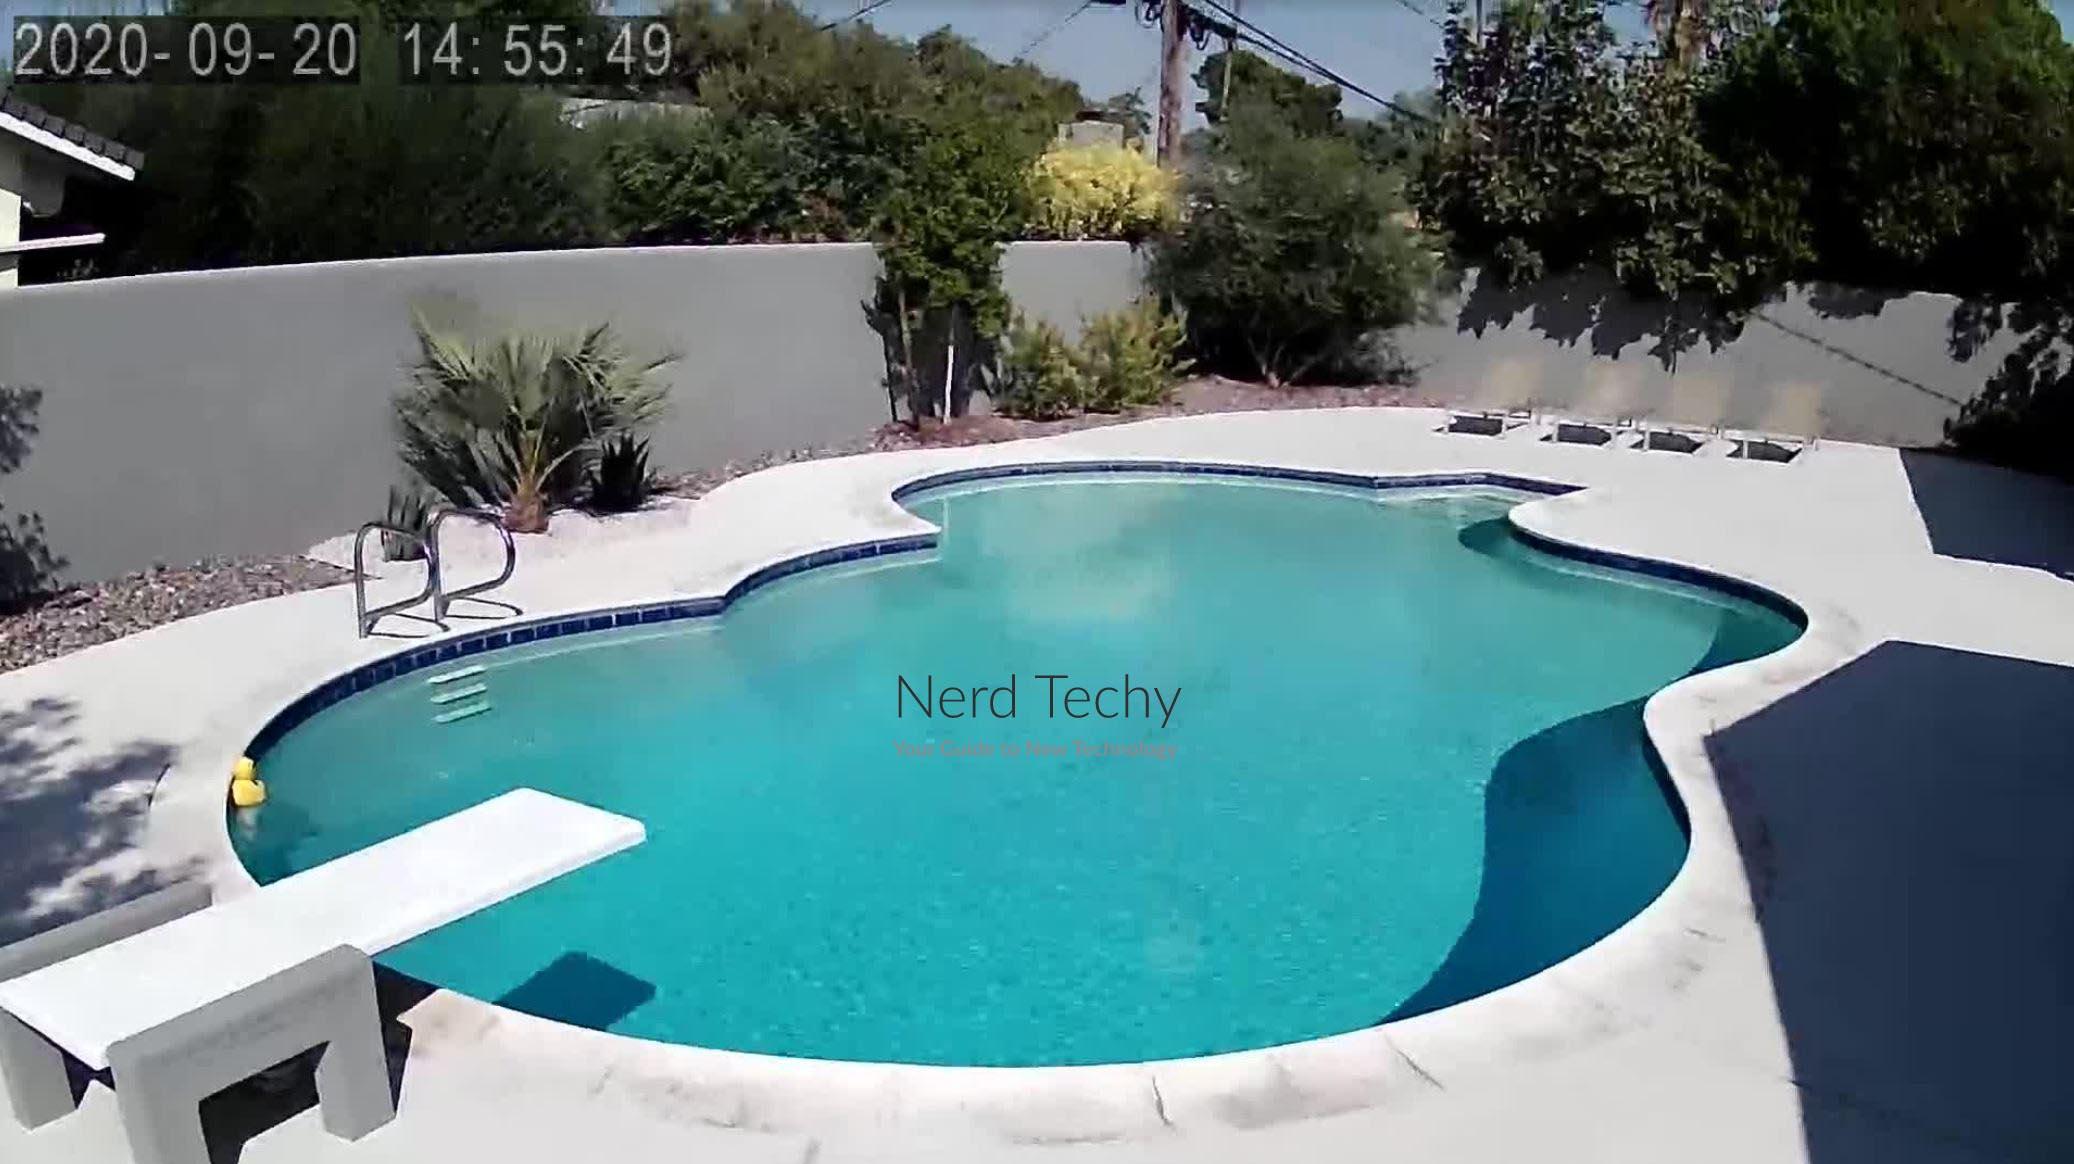 TENVIS-FHD-PTZ-Outdoor-Security-Camera-sample